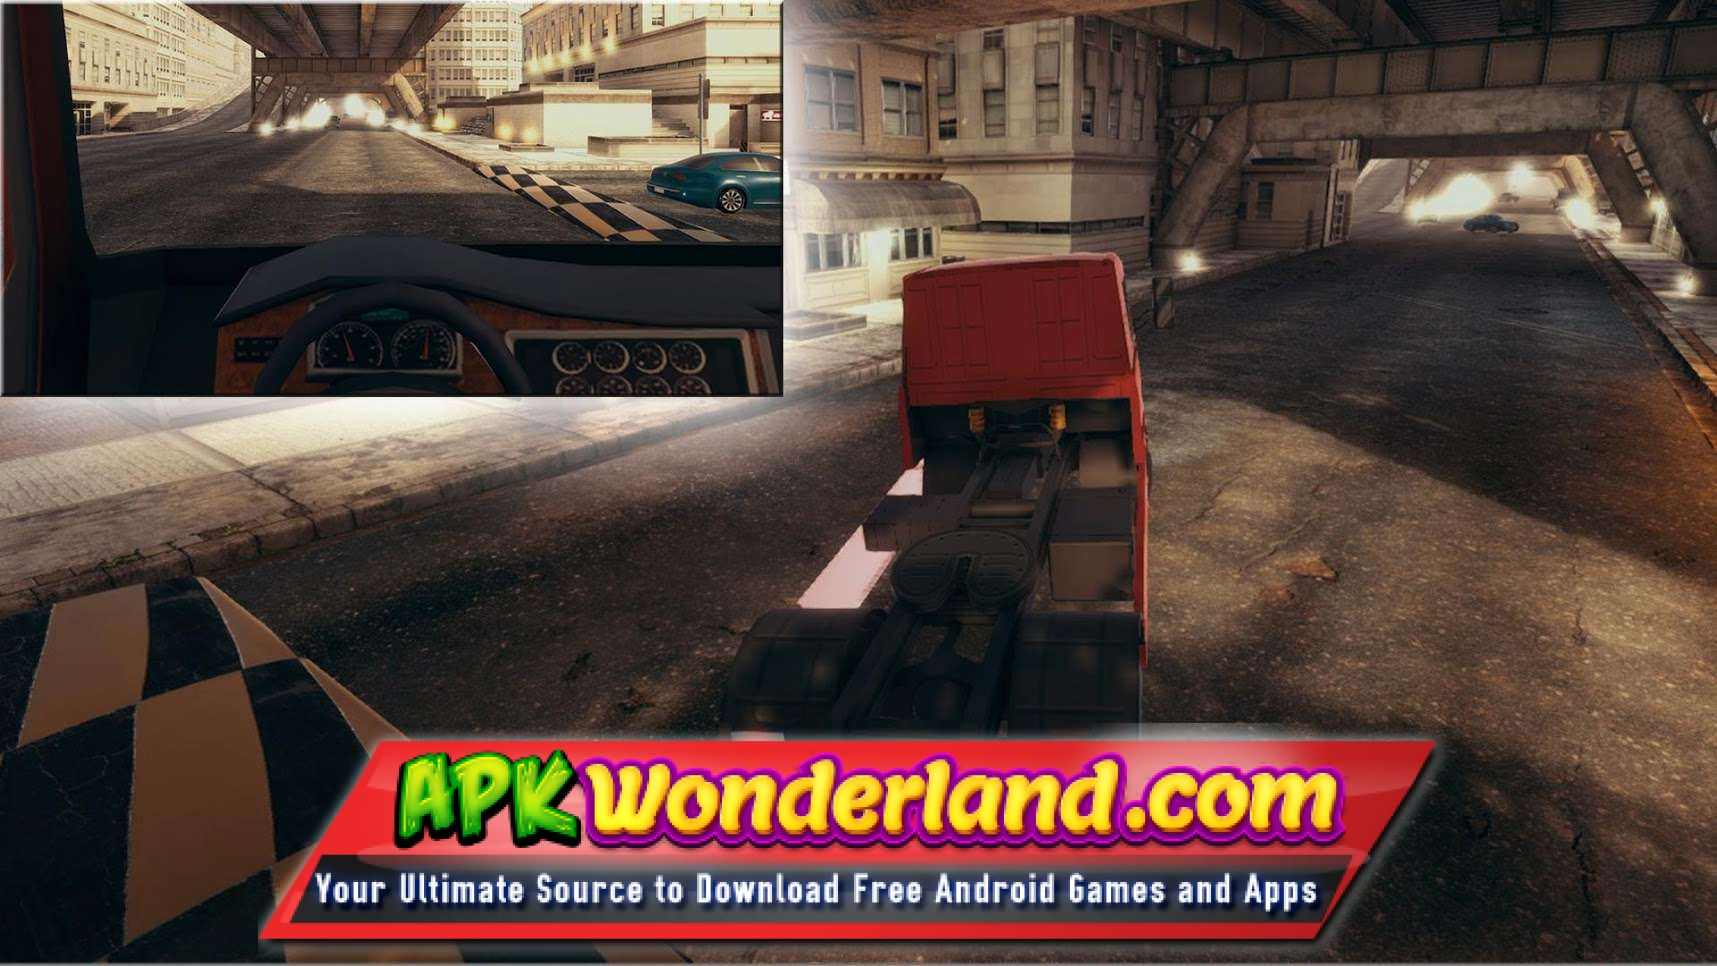 Car Driving In City 2 Apk free Download - APK Wonderland